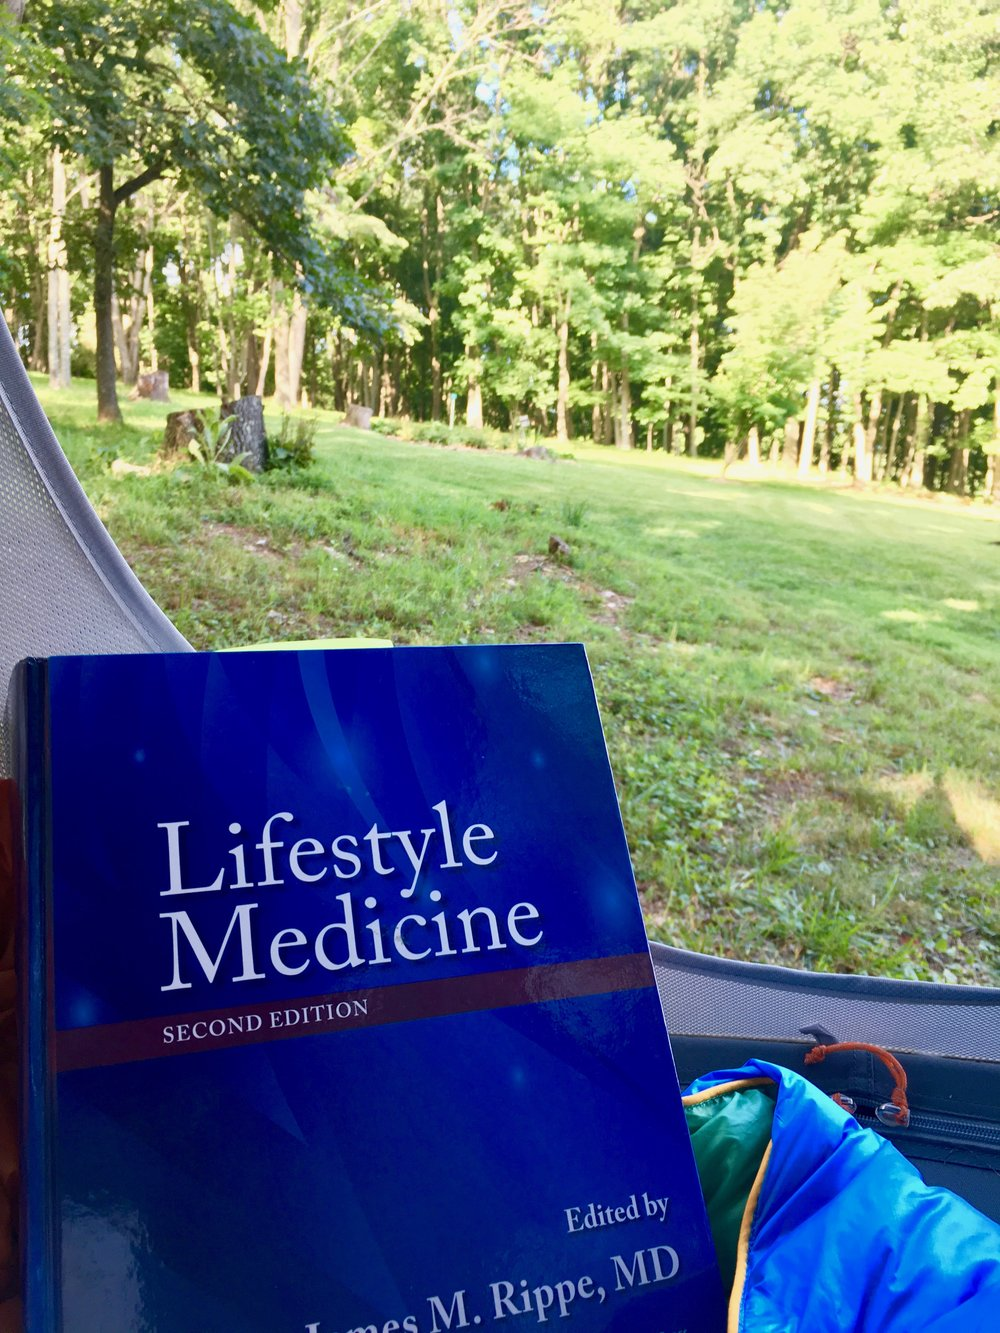 Lifestyle Medicine Book.jpeg